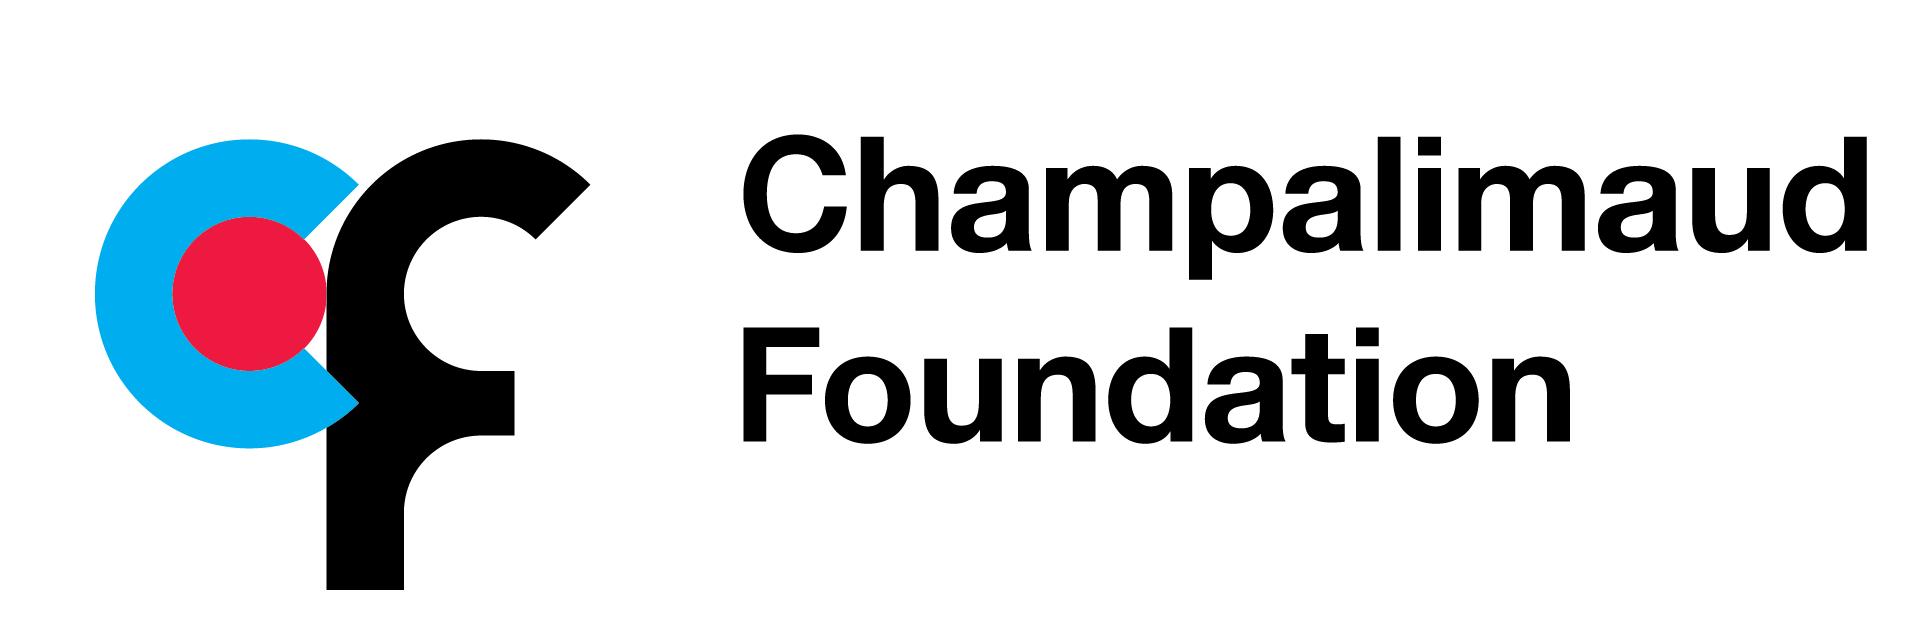 Fchampalimaud-Logo-01.png